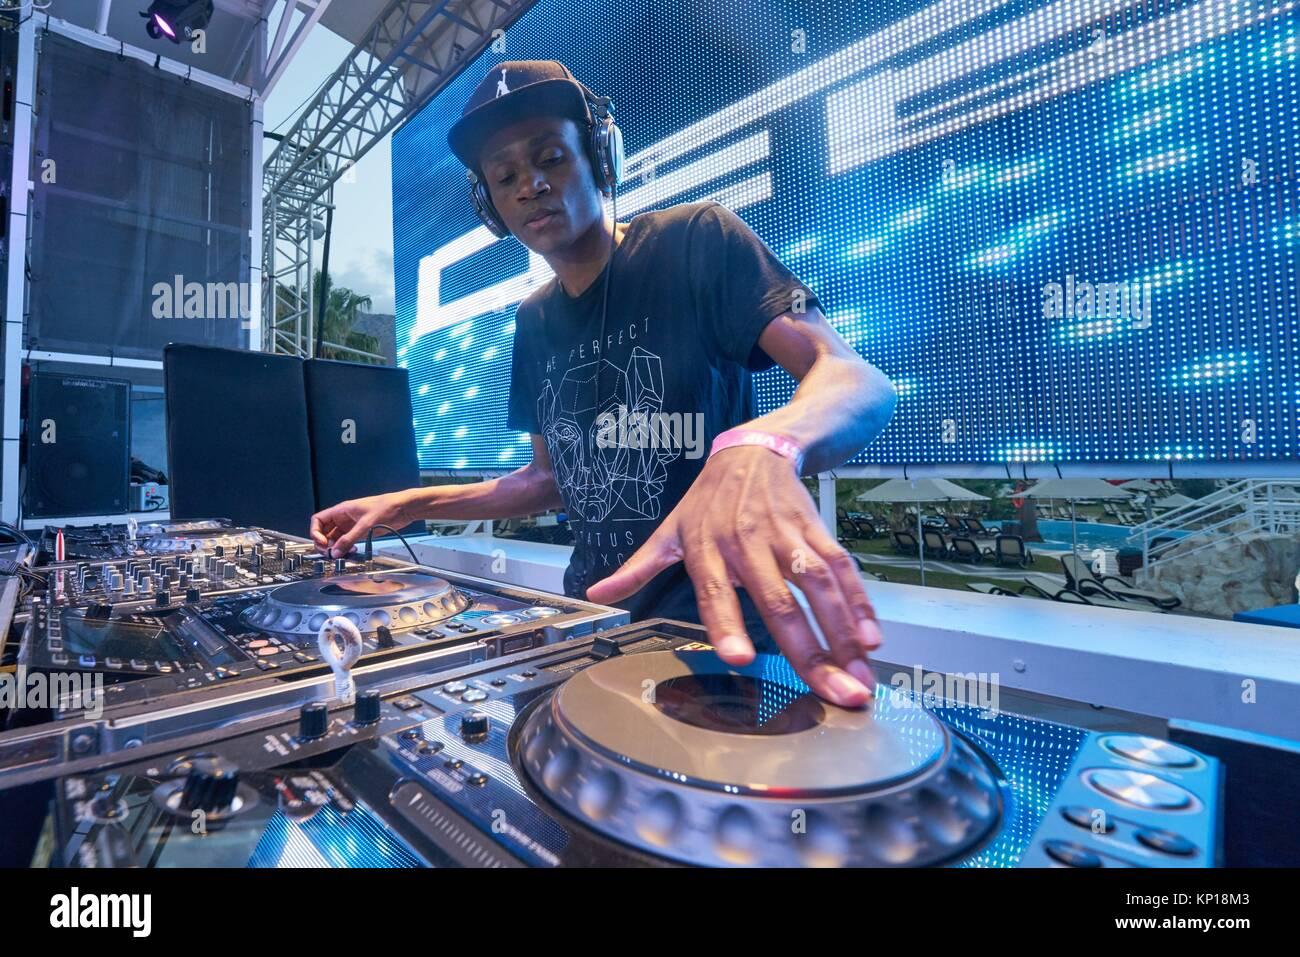 DJ DebK an Musik Festival Starbeach Lovestar Neon in Hersonissos, Kreta, Griechenland, am 23. August 2017 Stockbild